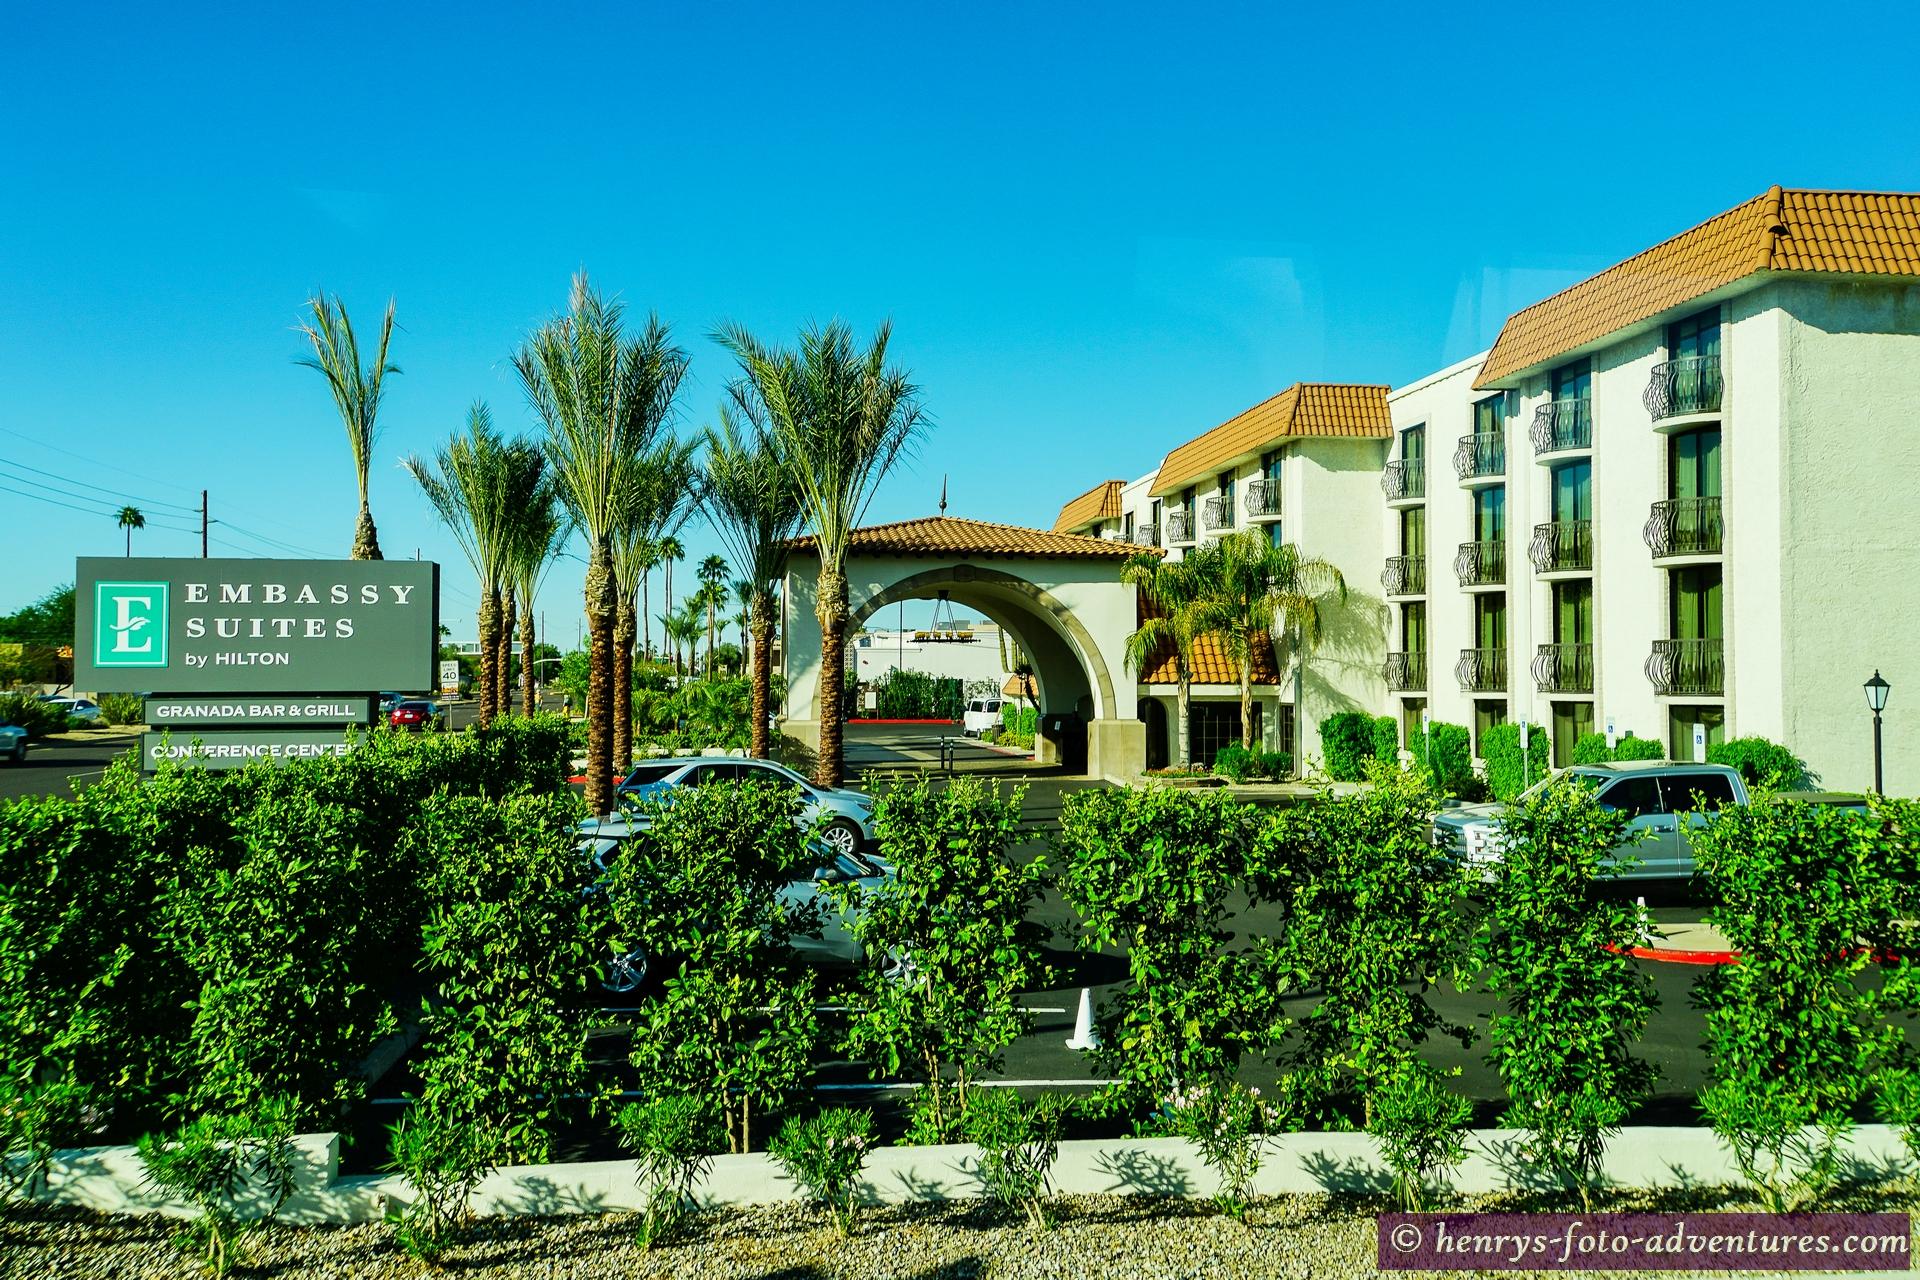 Hotel Hilton Embassy Suites